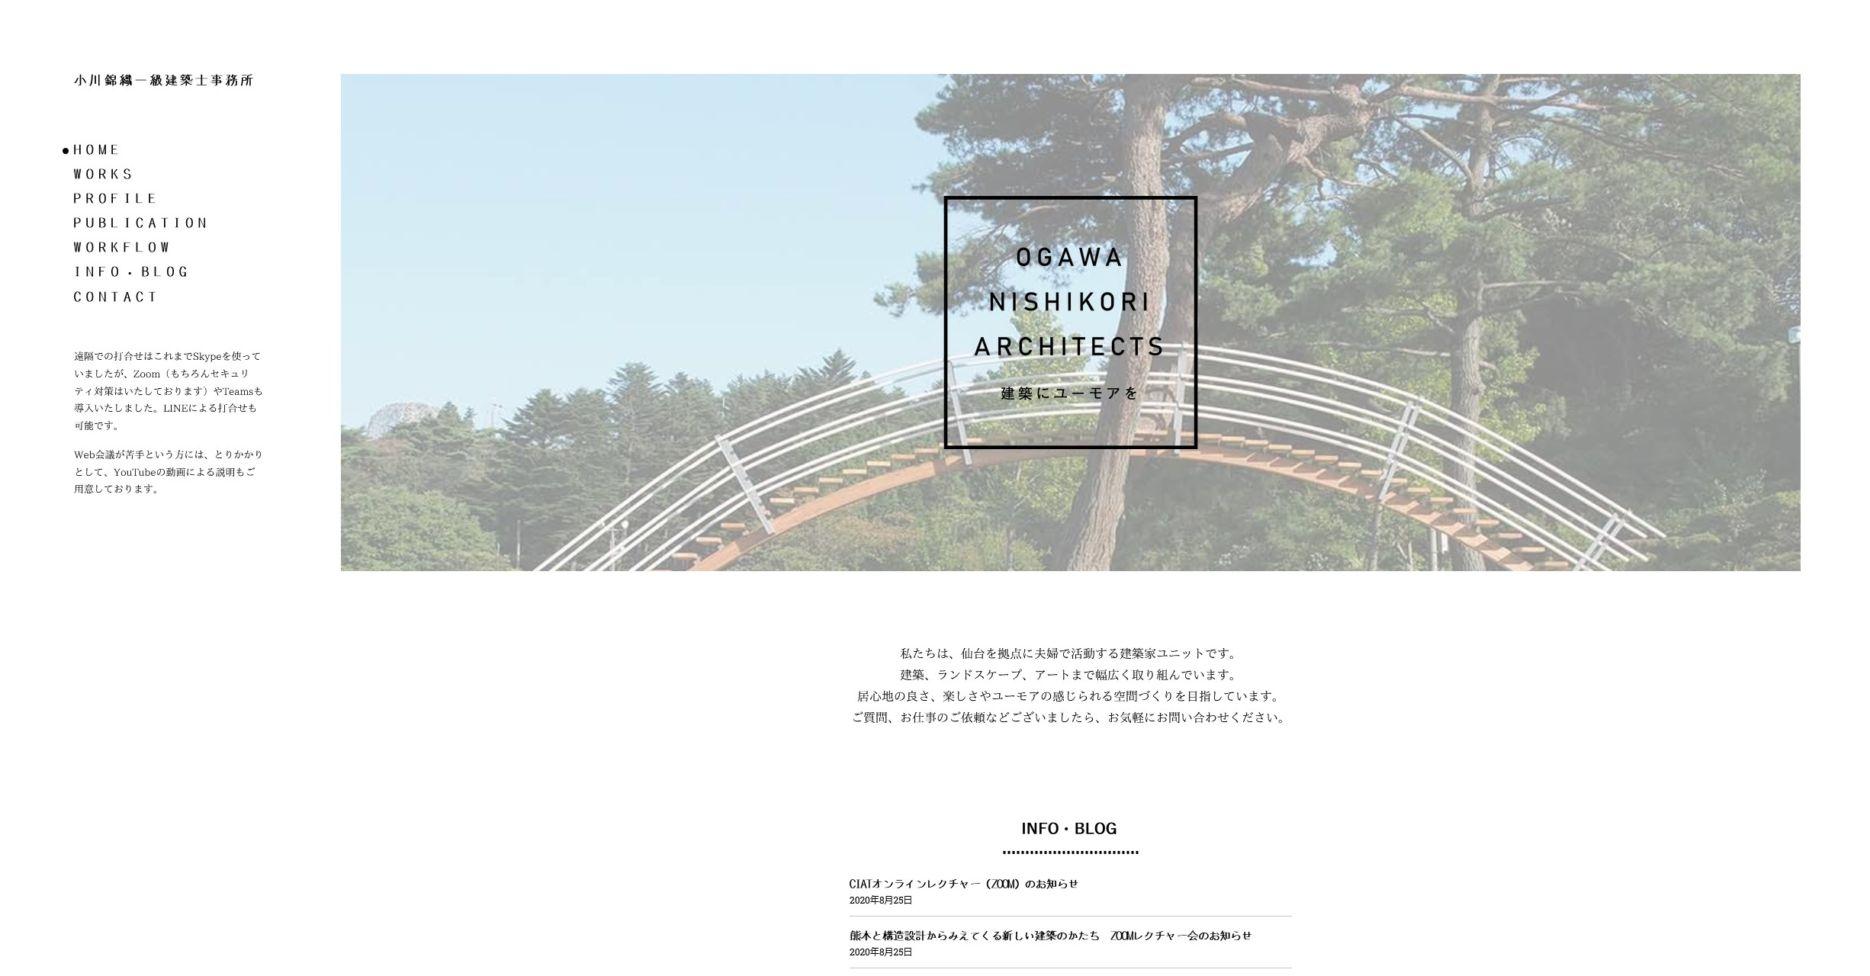 SnapCrab_NoName_2020-9-15_16-55-7_No-00